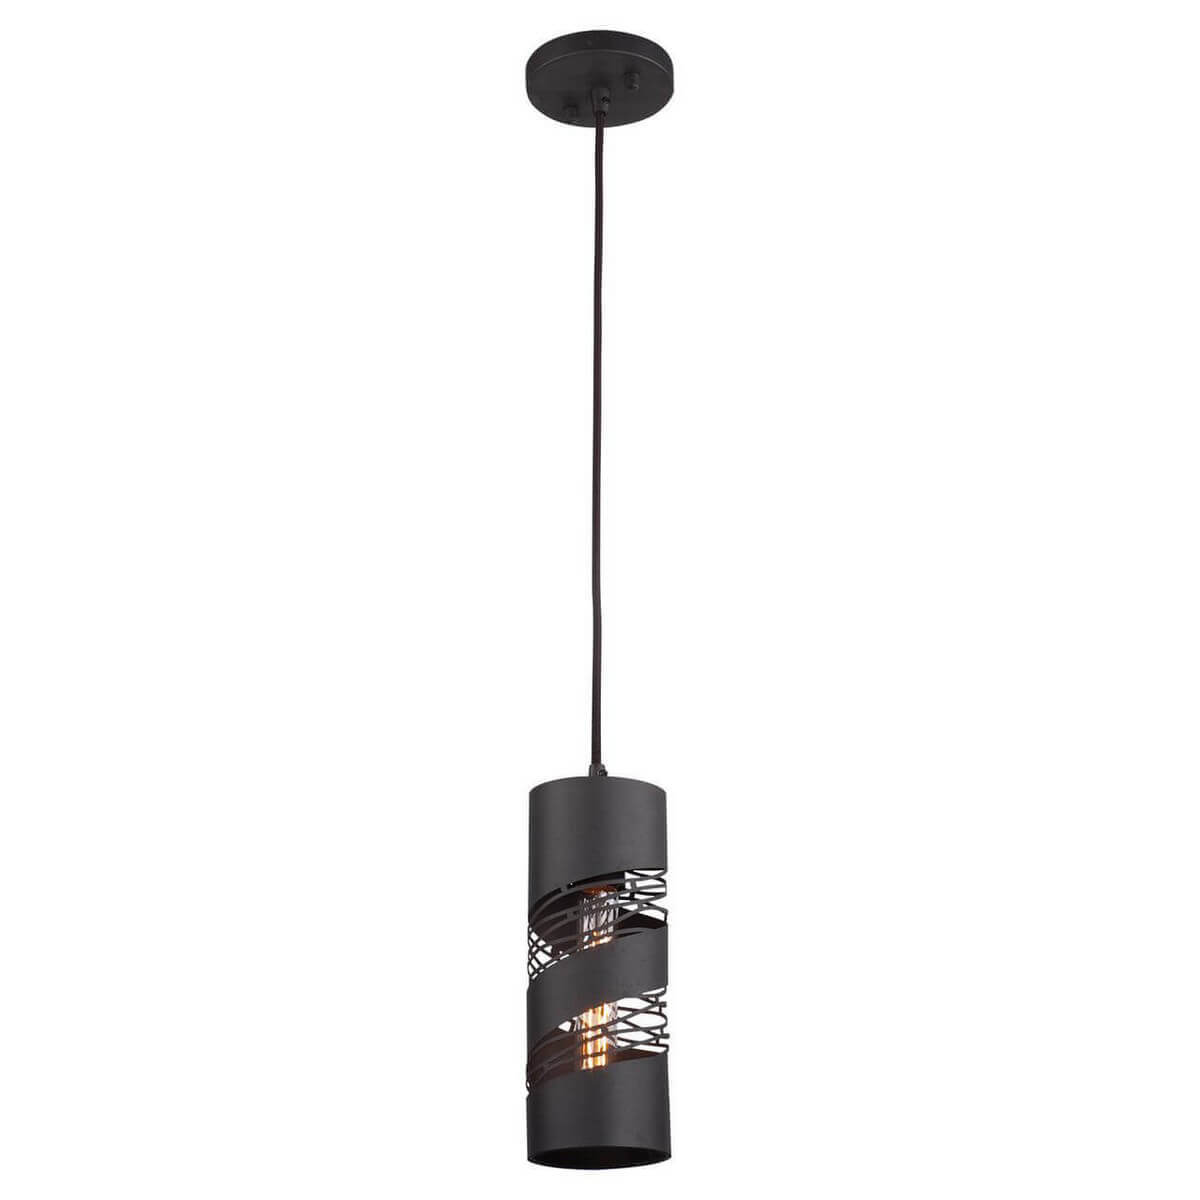 Светильник Lussole LOFT GRLSP-9651 Dix Hills printio otto dix